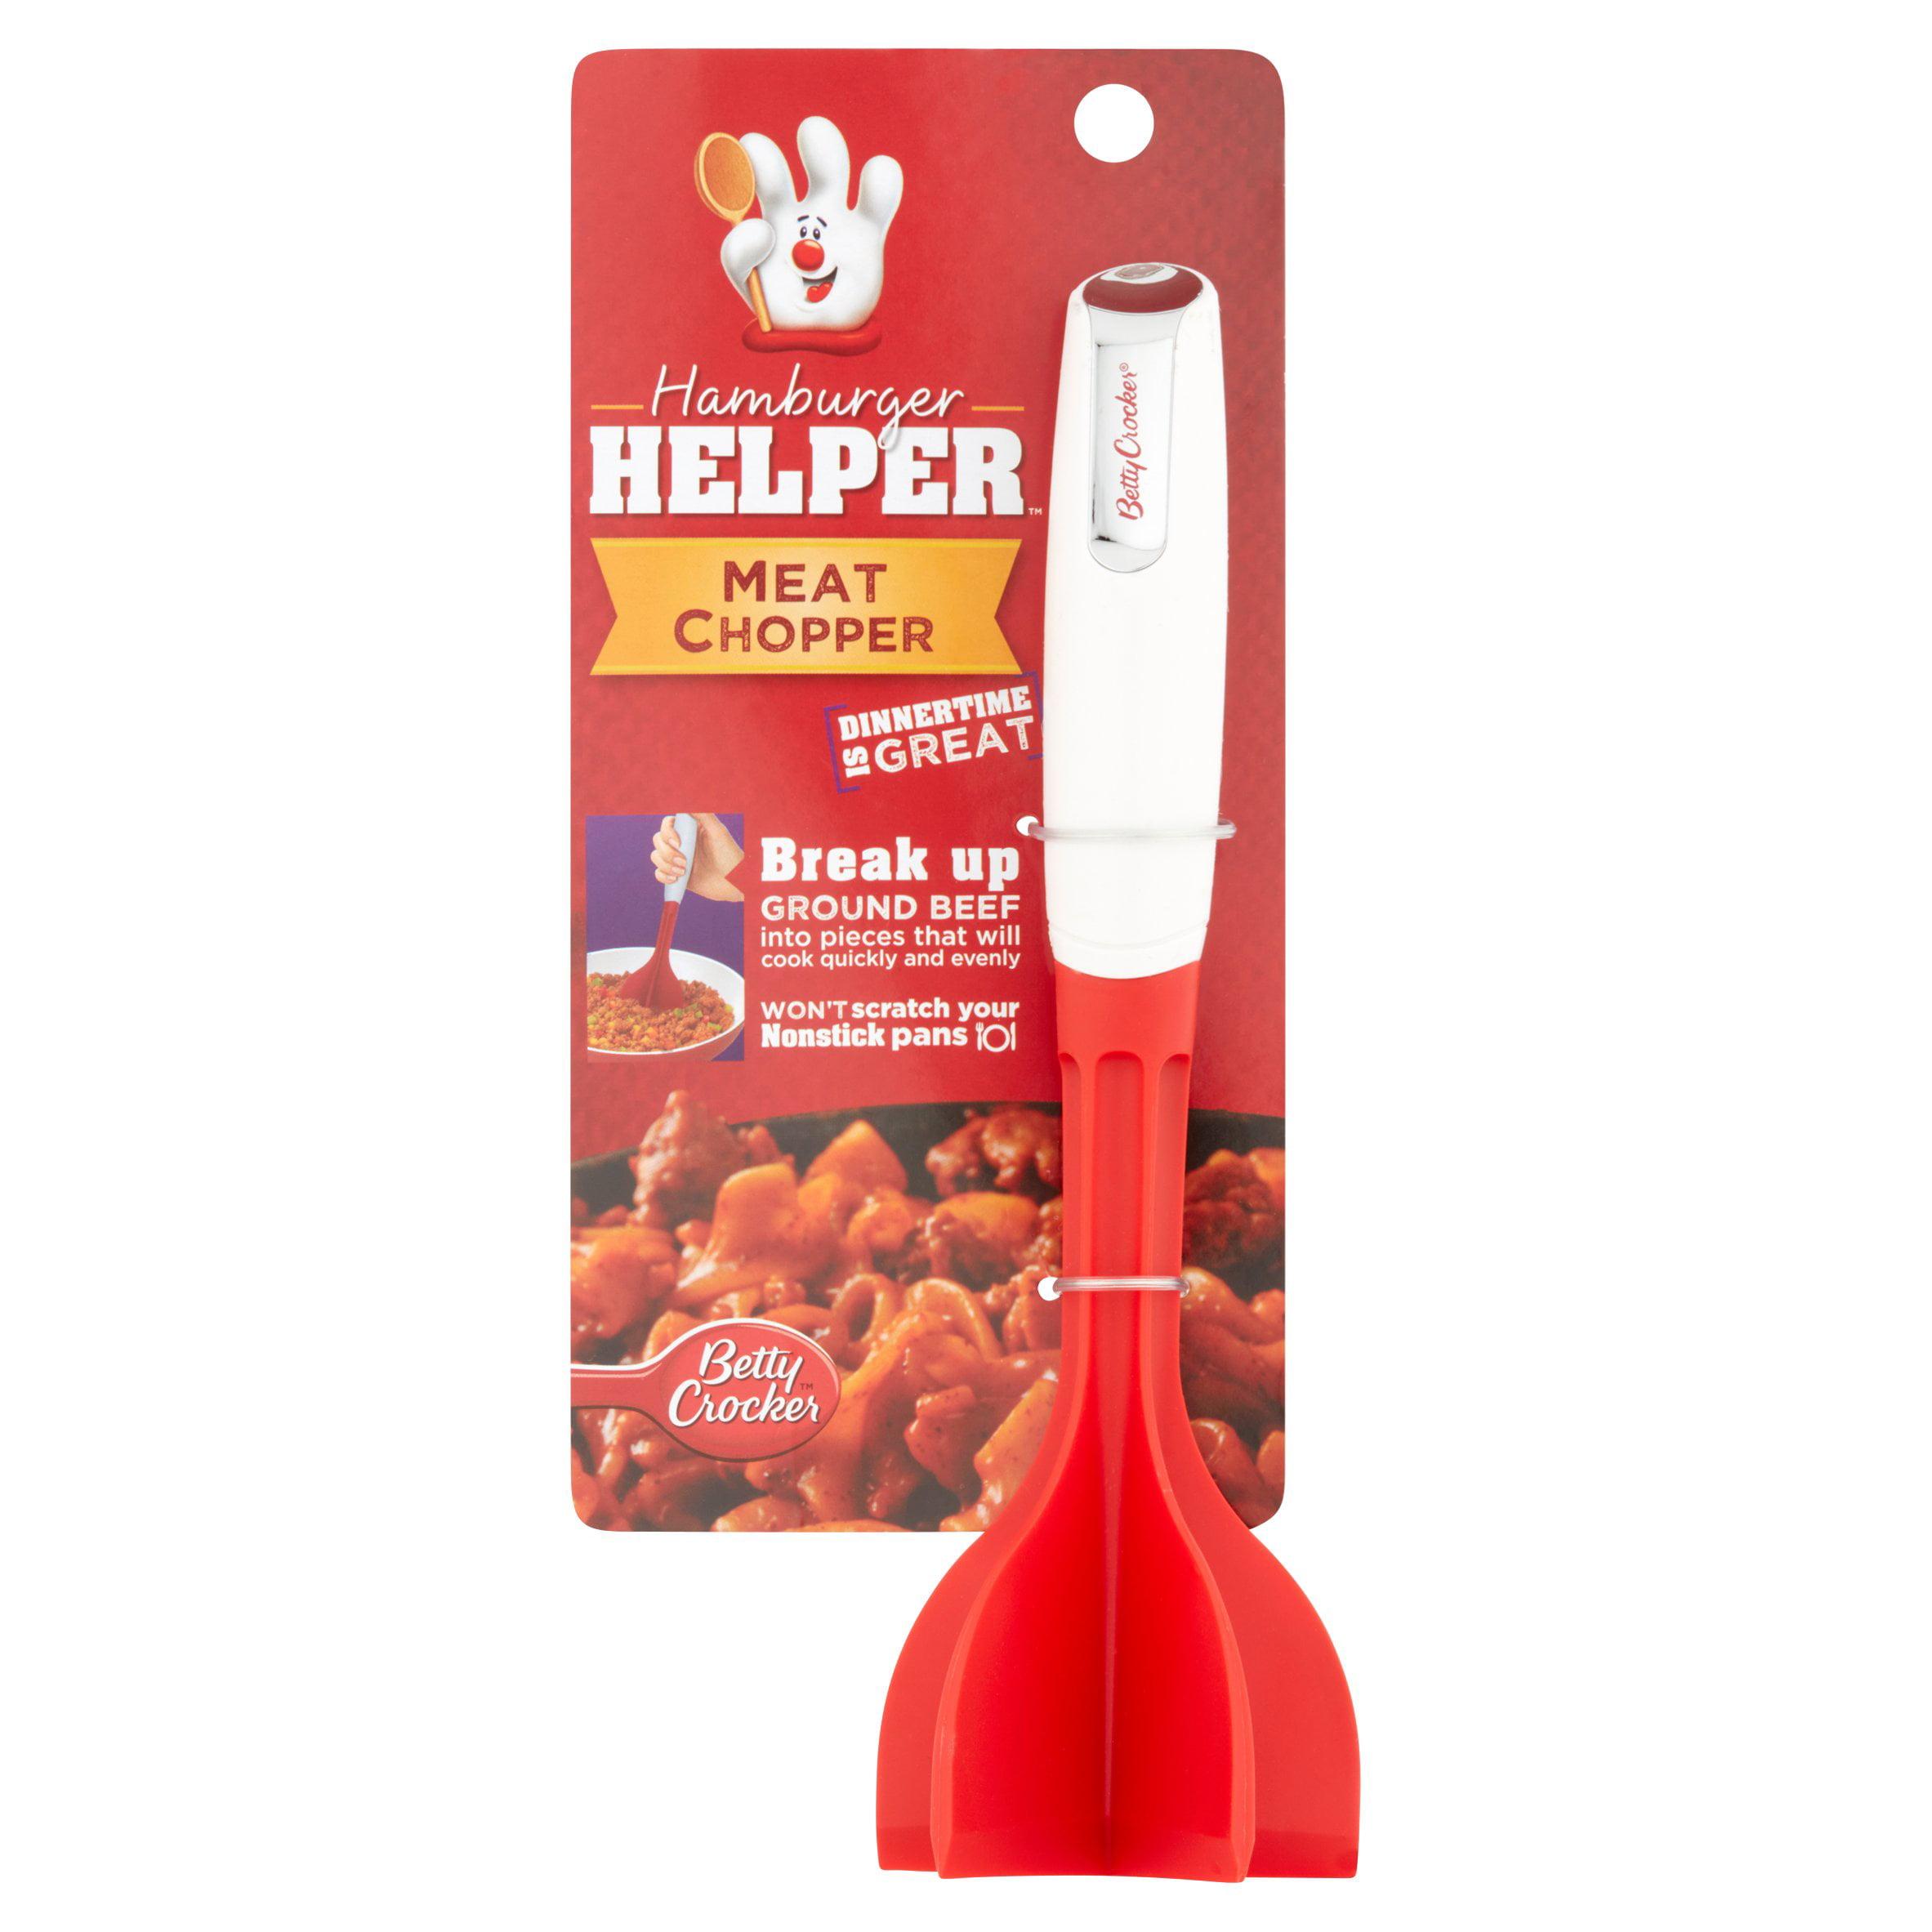 Betty Crocker Hamburger Helper Meat Chopper